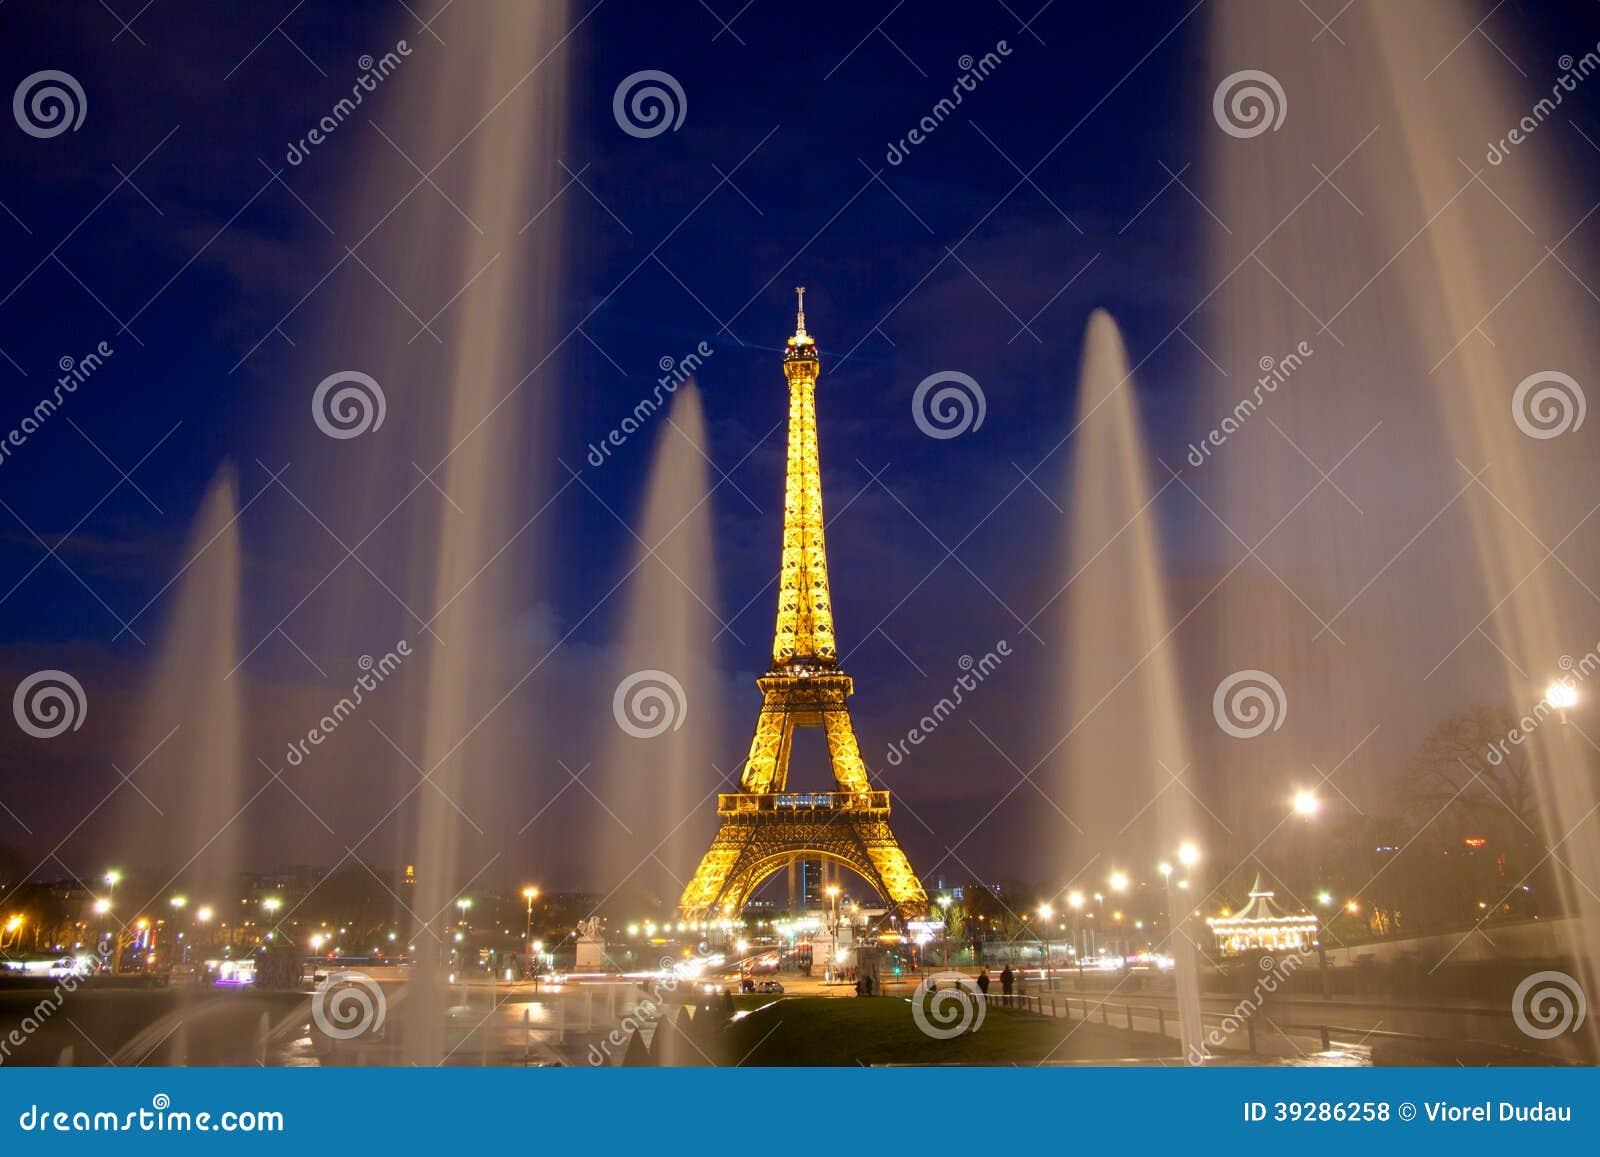 Paris Eiffel tower by night